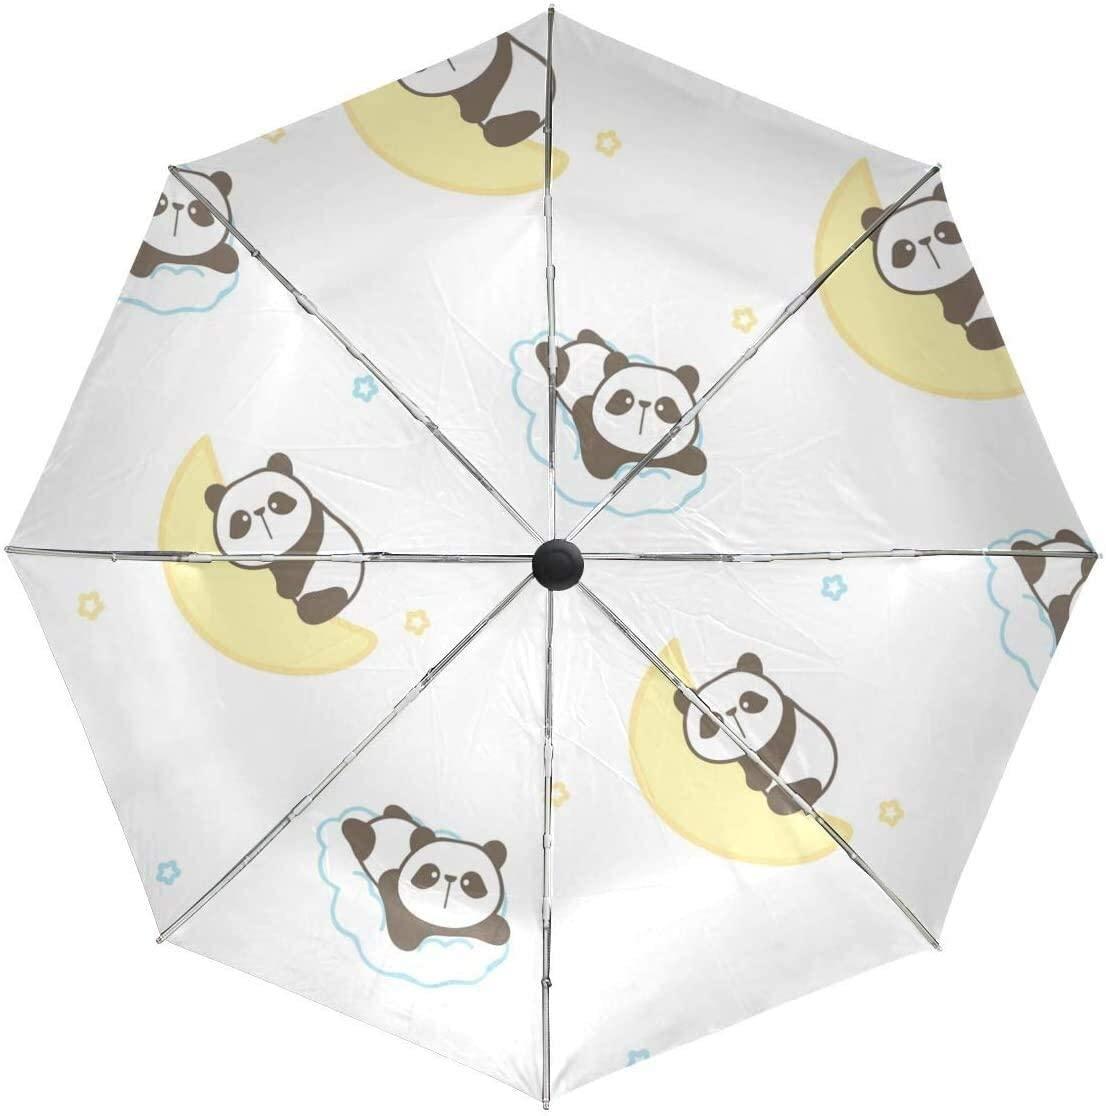 Automatic Umbrellas Cute Animal Pnada Moon Anti-Slip Windproof Compact Rain Umbrella for Women Men